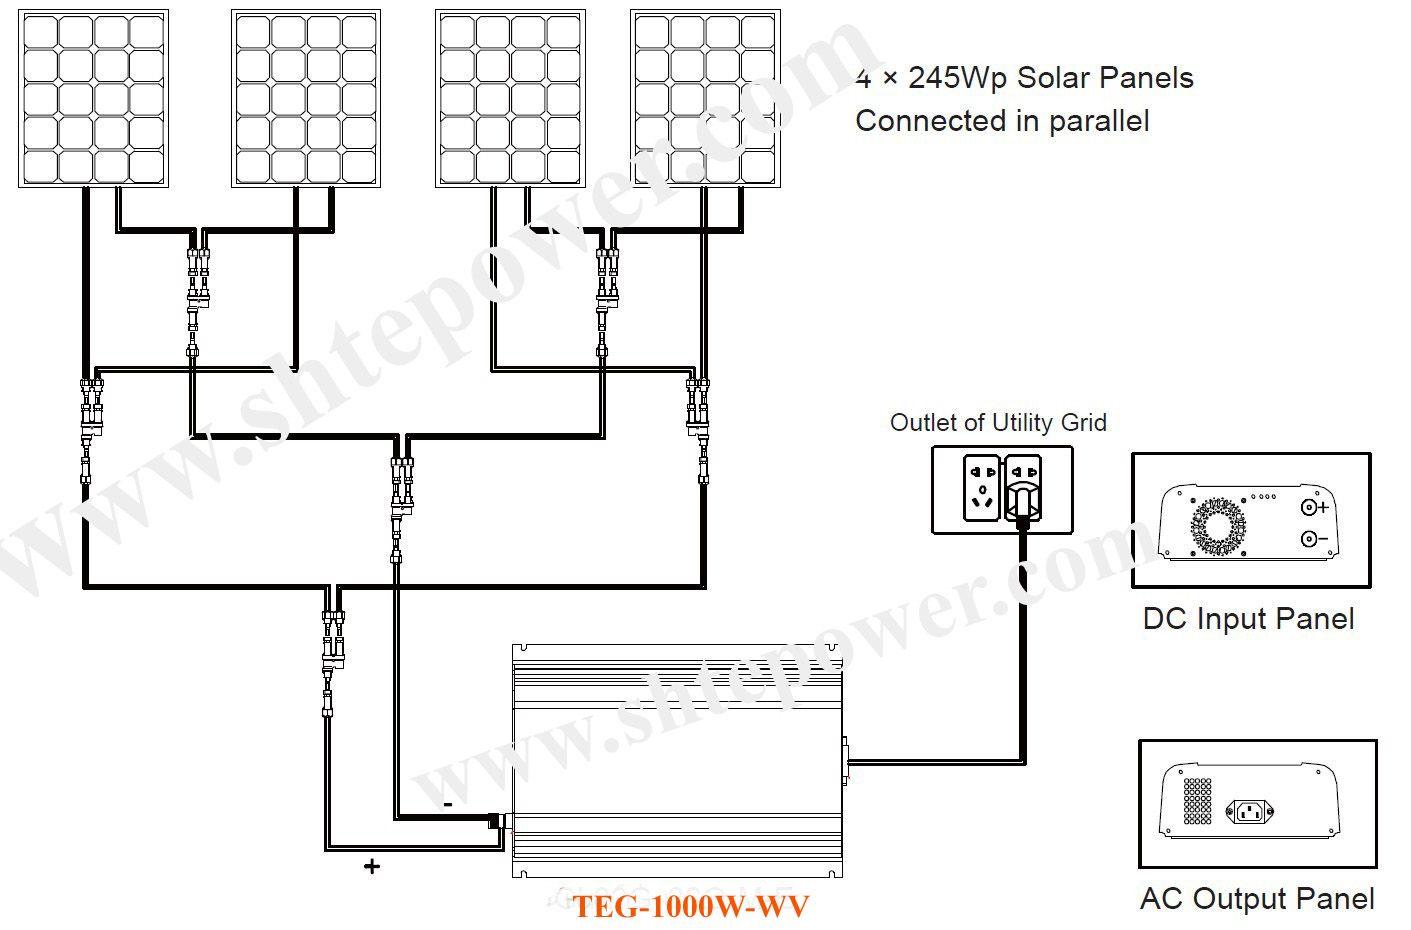 solar wiring diagram off grid 1995 honda civic dx stereo 500w inverter tie homemade